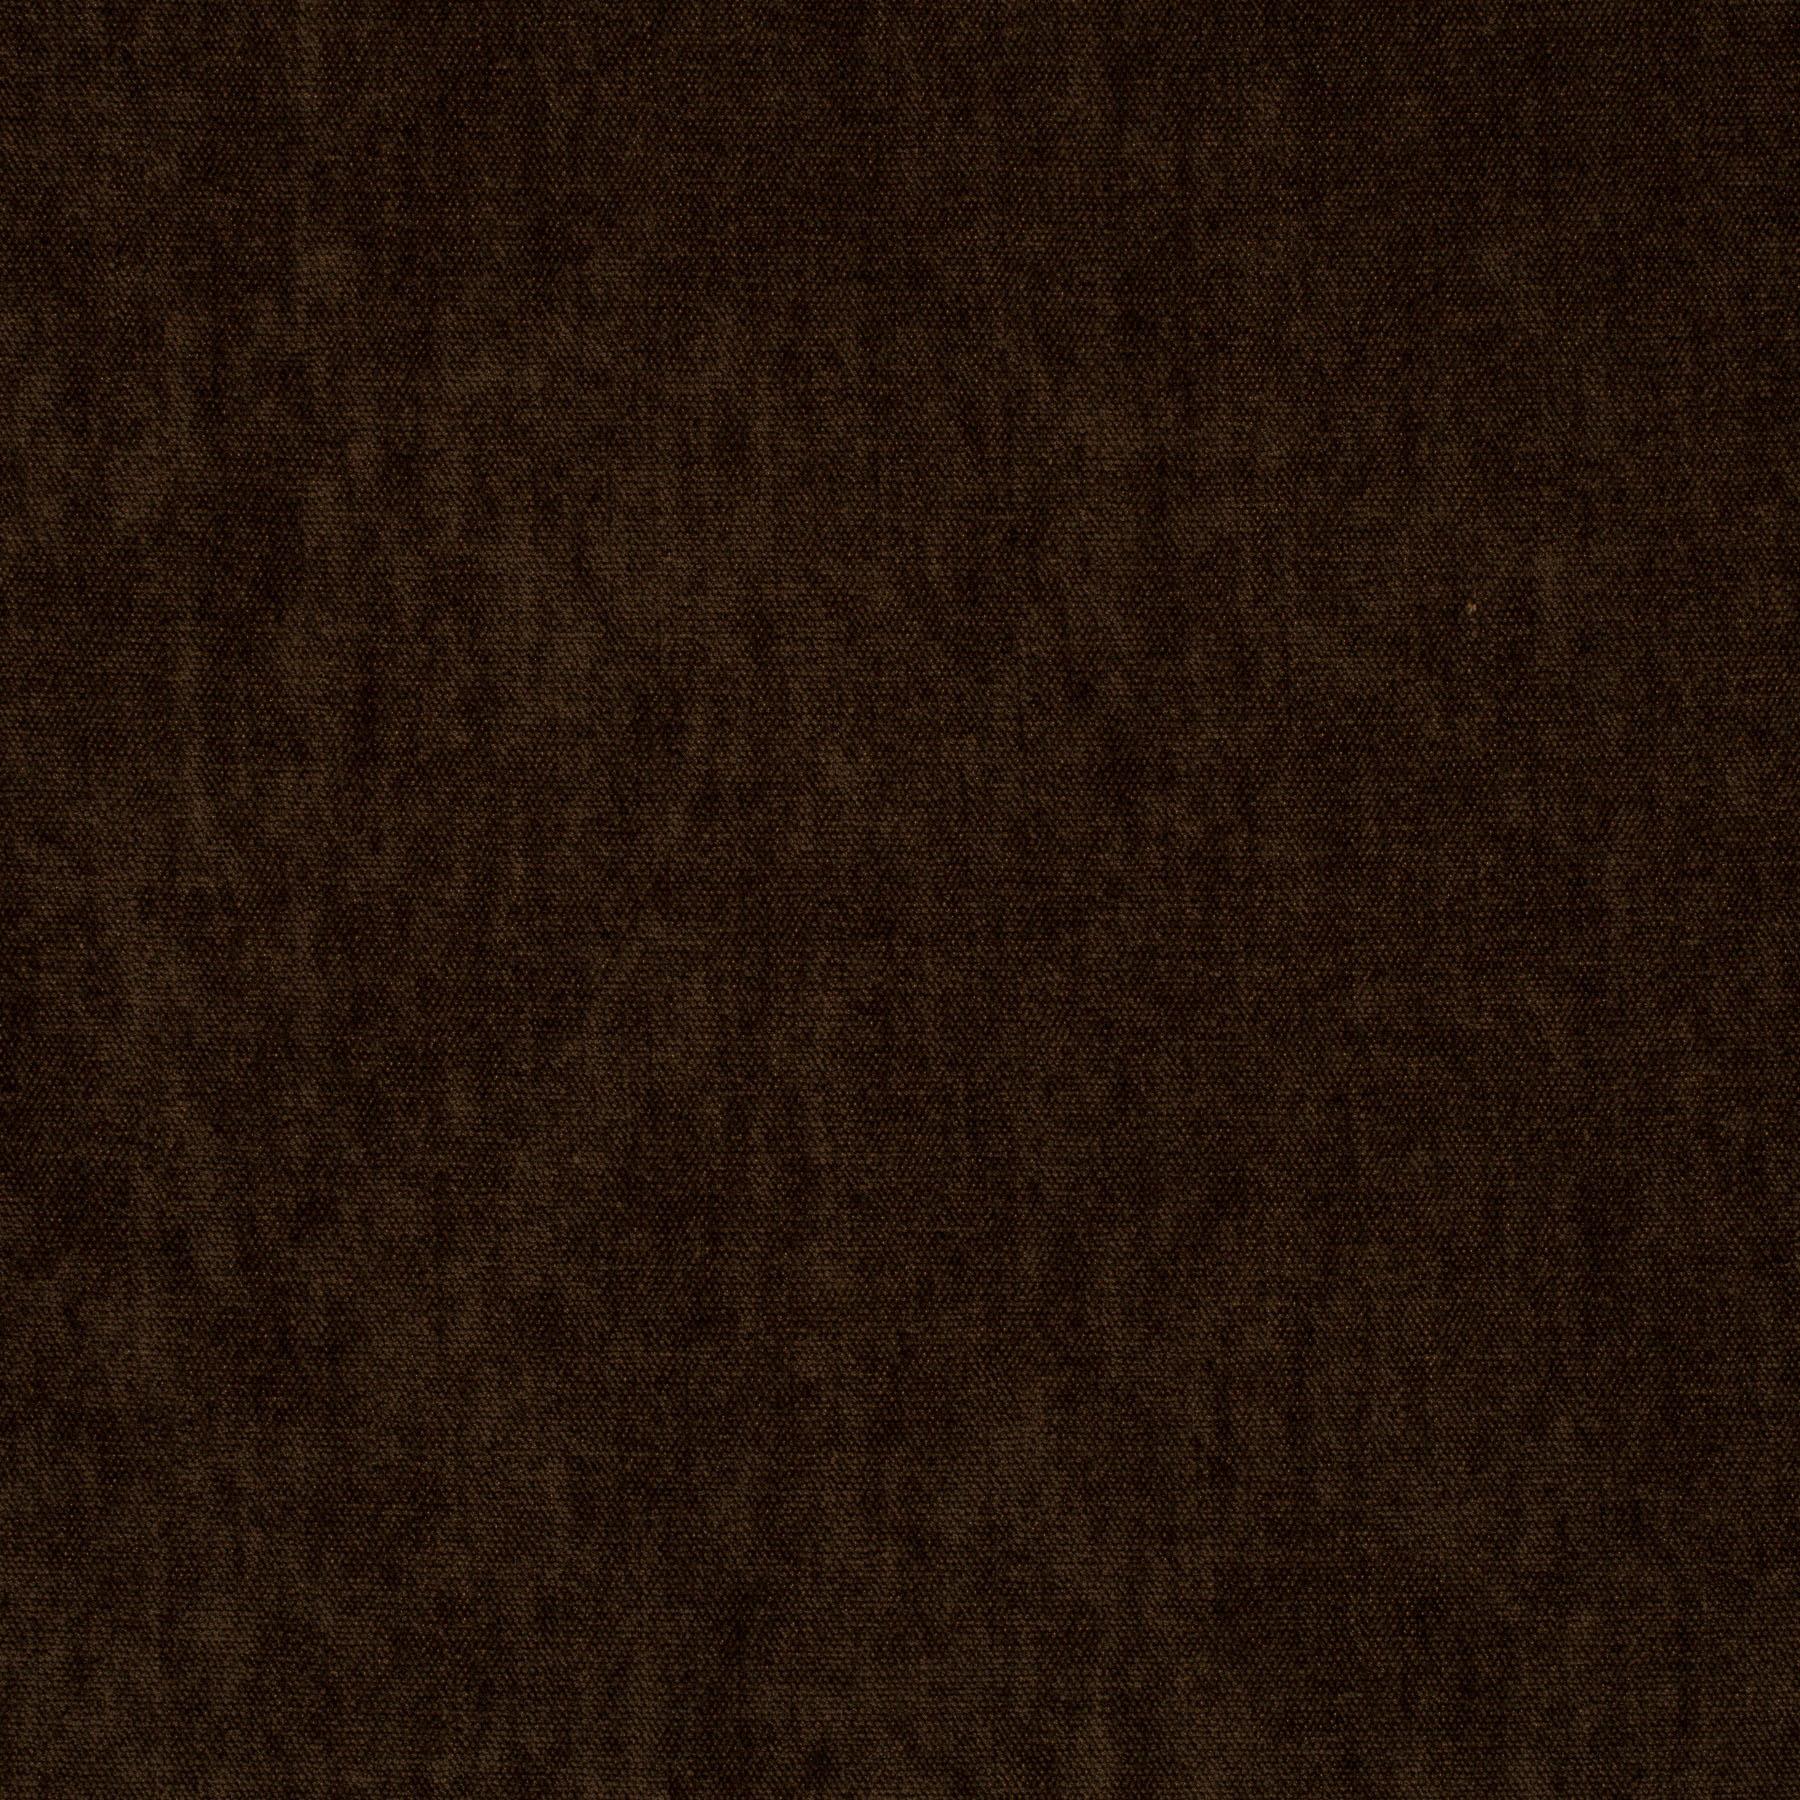 decoration fabric diego vol 2 1 6579 023 jab anstoetz. Black Bedroom Furniture Sets. Home Design Ideas